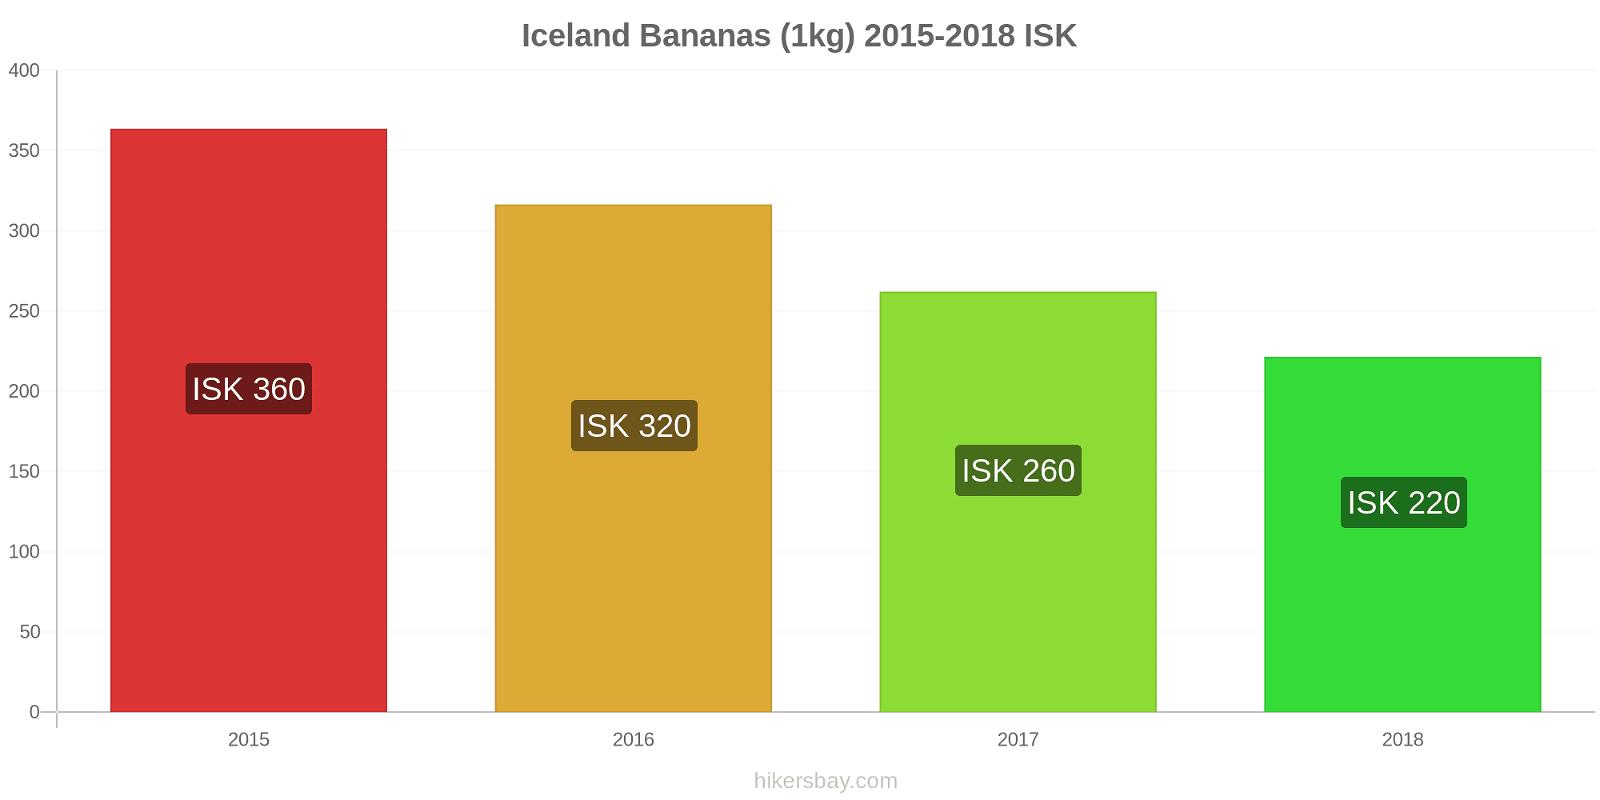 Iceland price changes Bananas (1kg) hikersbay.com